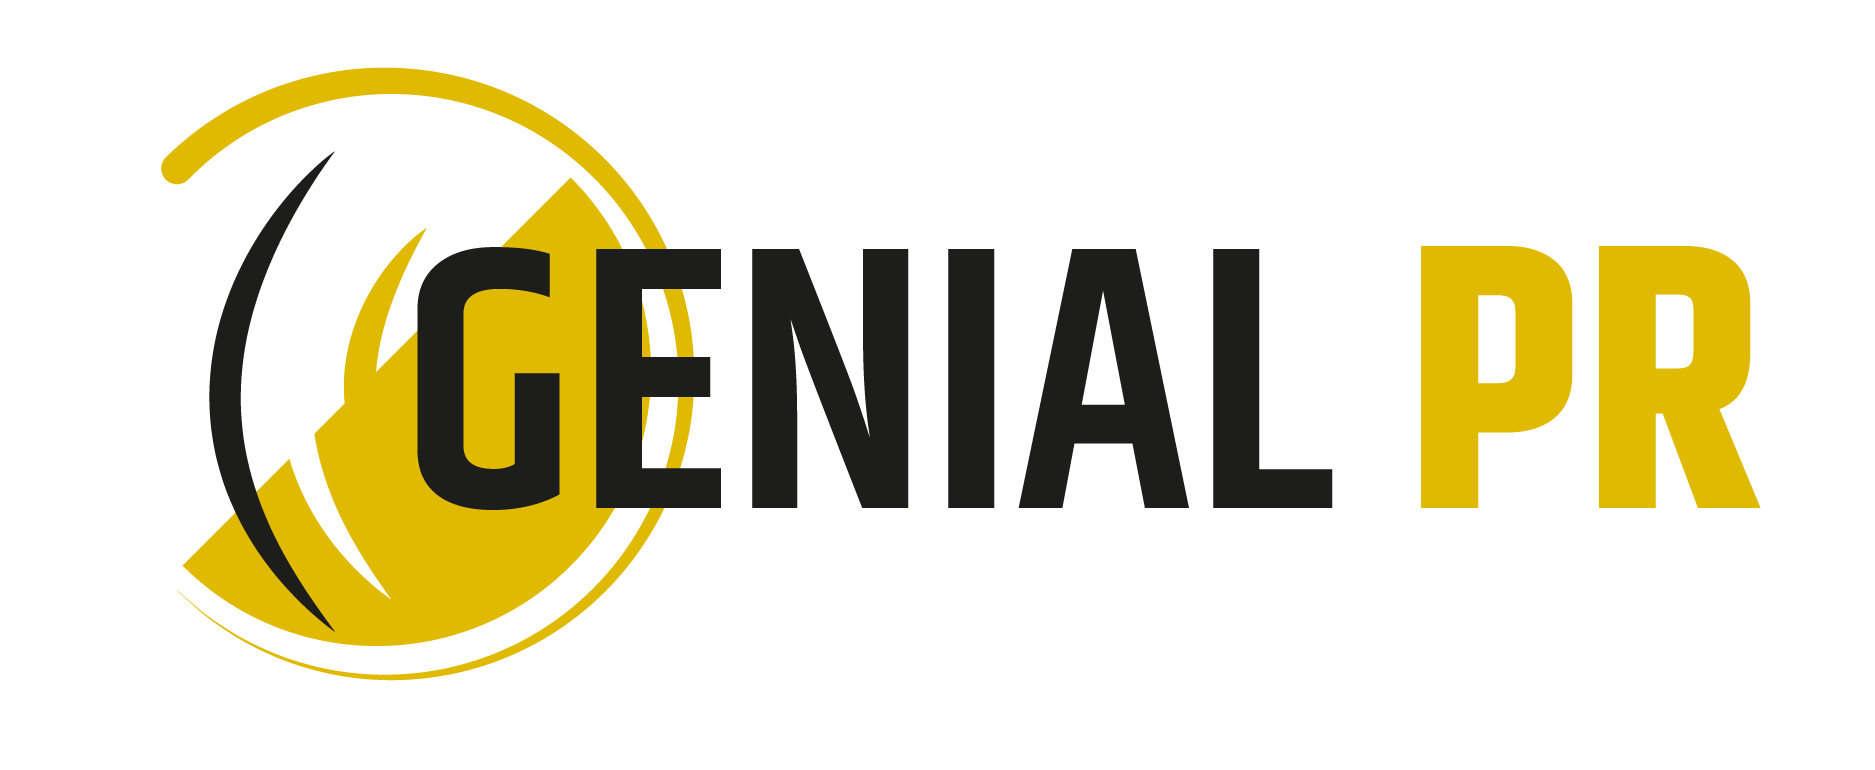 Genial-Pr_chosen